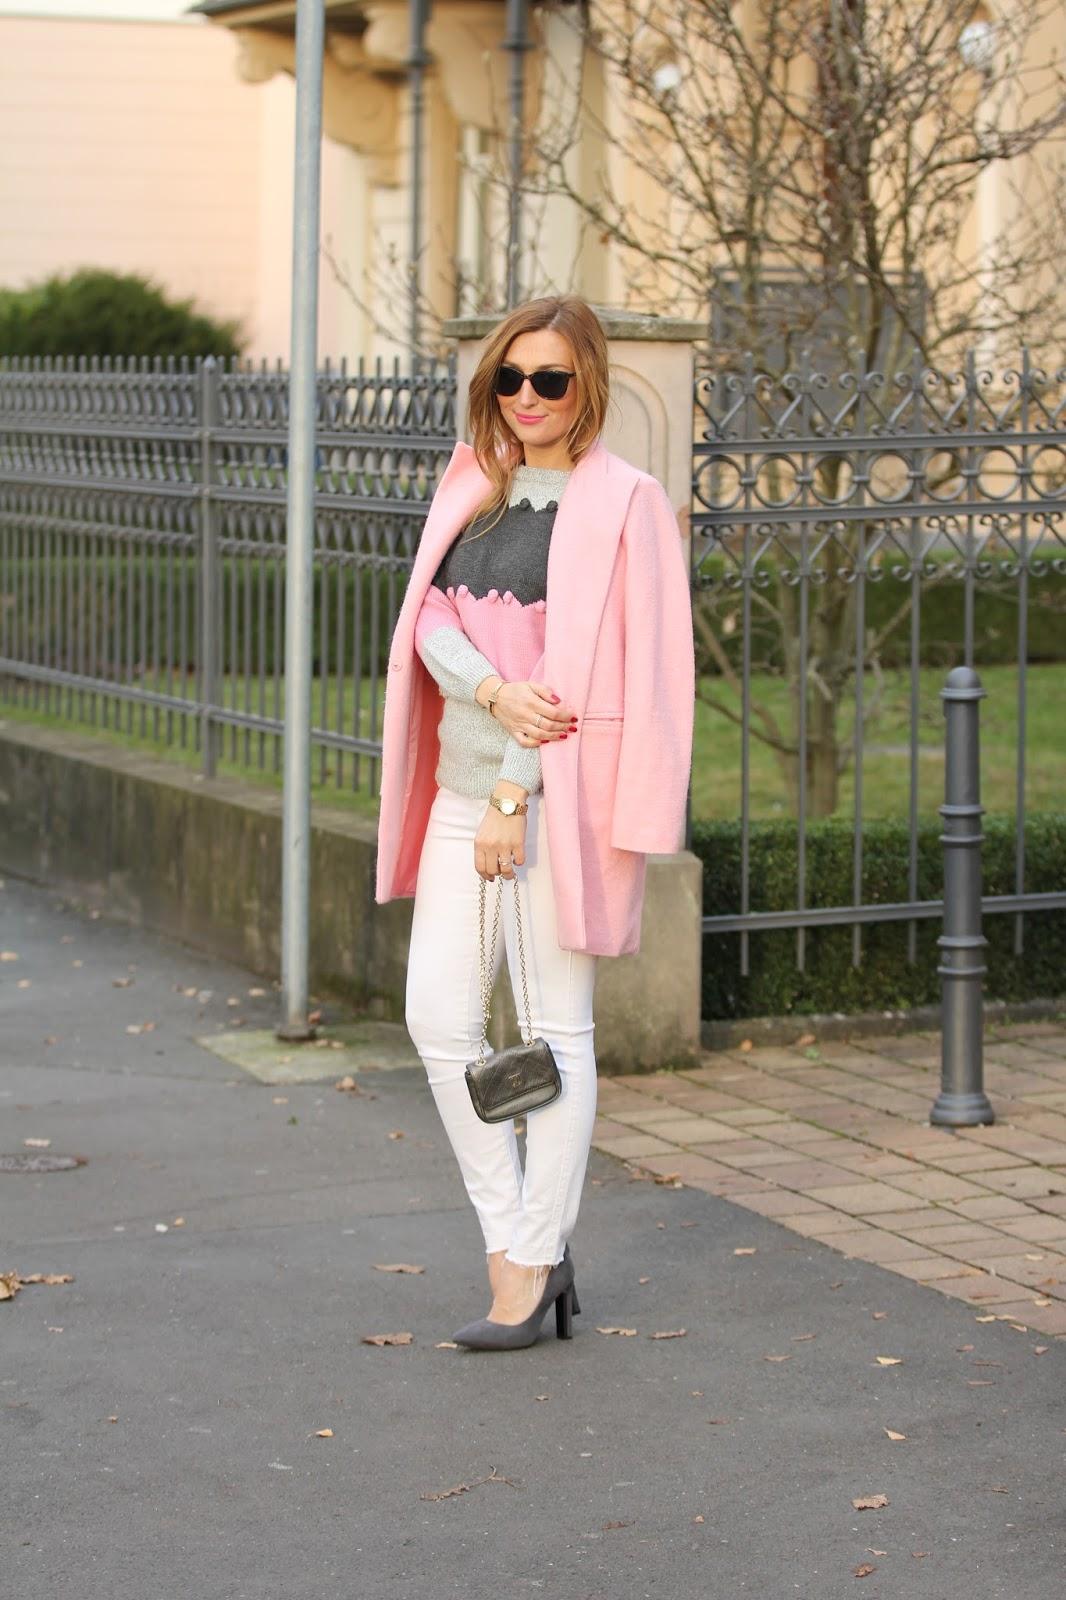 Fashionstylebyjohanna-bogger-asu-deutschland-pastell-farben-pastell-mantel-rosa-mantel